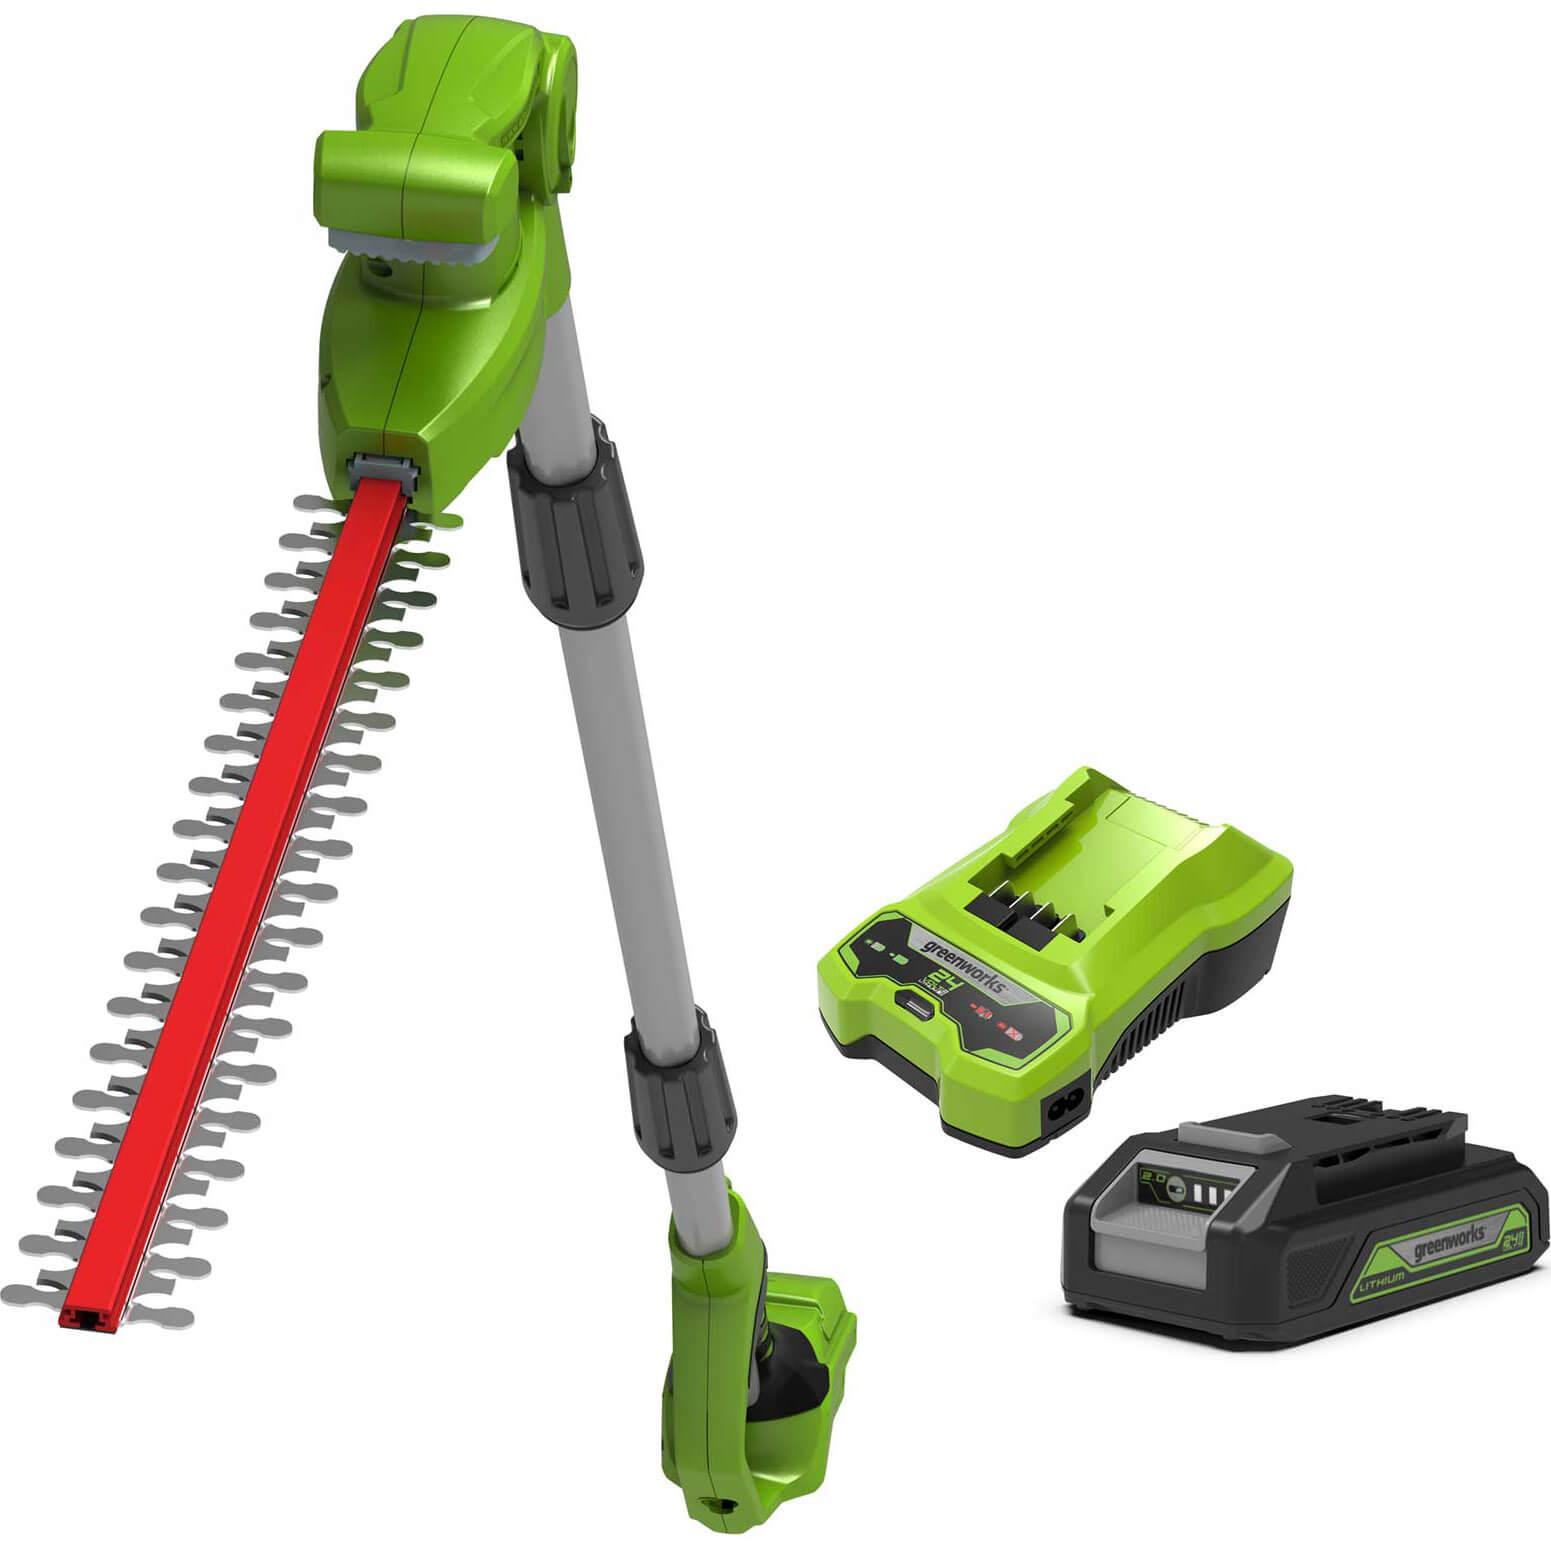 Greenworks G24LRHT 24v Cordless Long Reach Hedge Trimmer 510mm 1 x 2ah Li-ion Charger